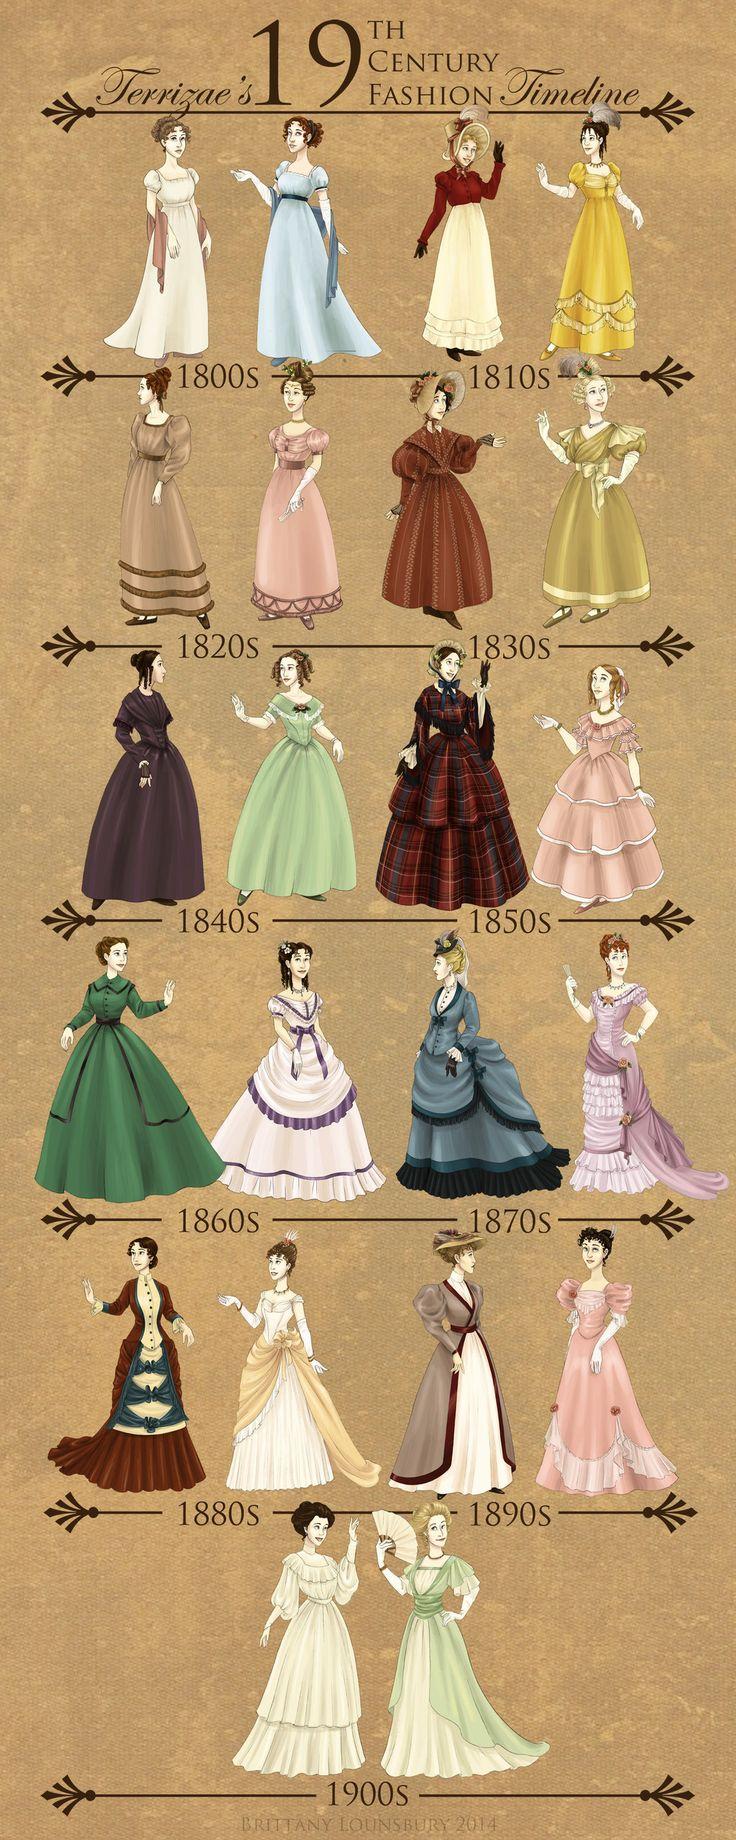 19th Century Fashion Timeline by Terrizae.deviantart.com on @deviantART